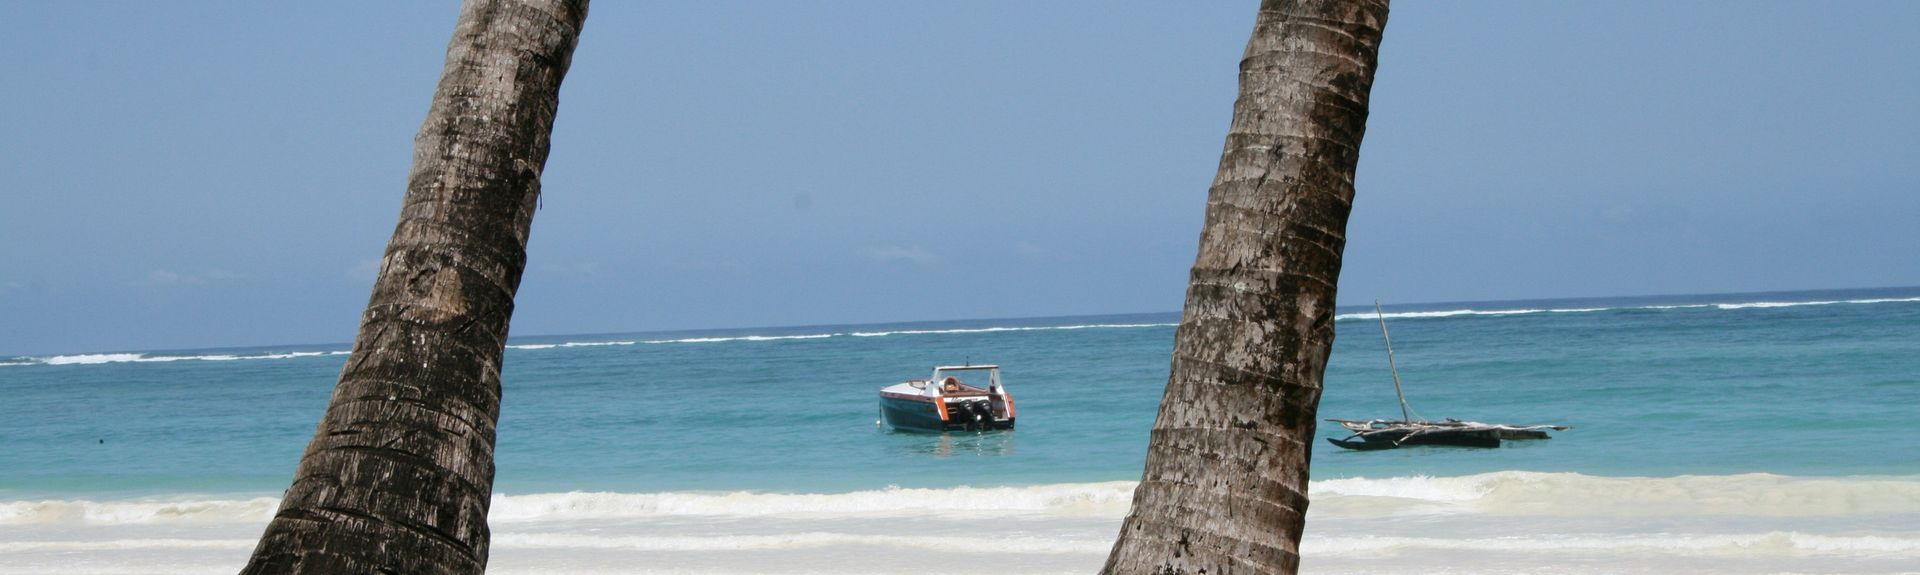 Kenya Coast, Kenya